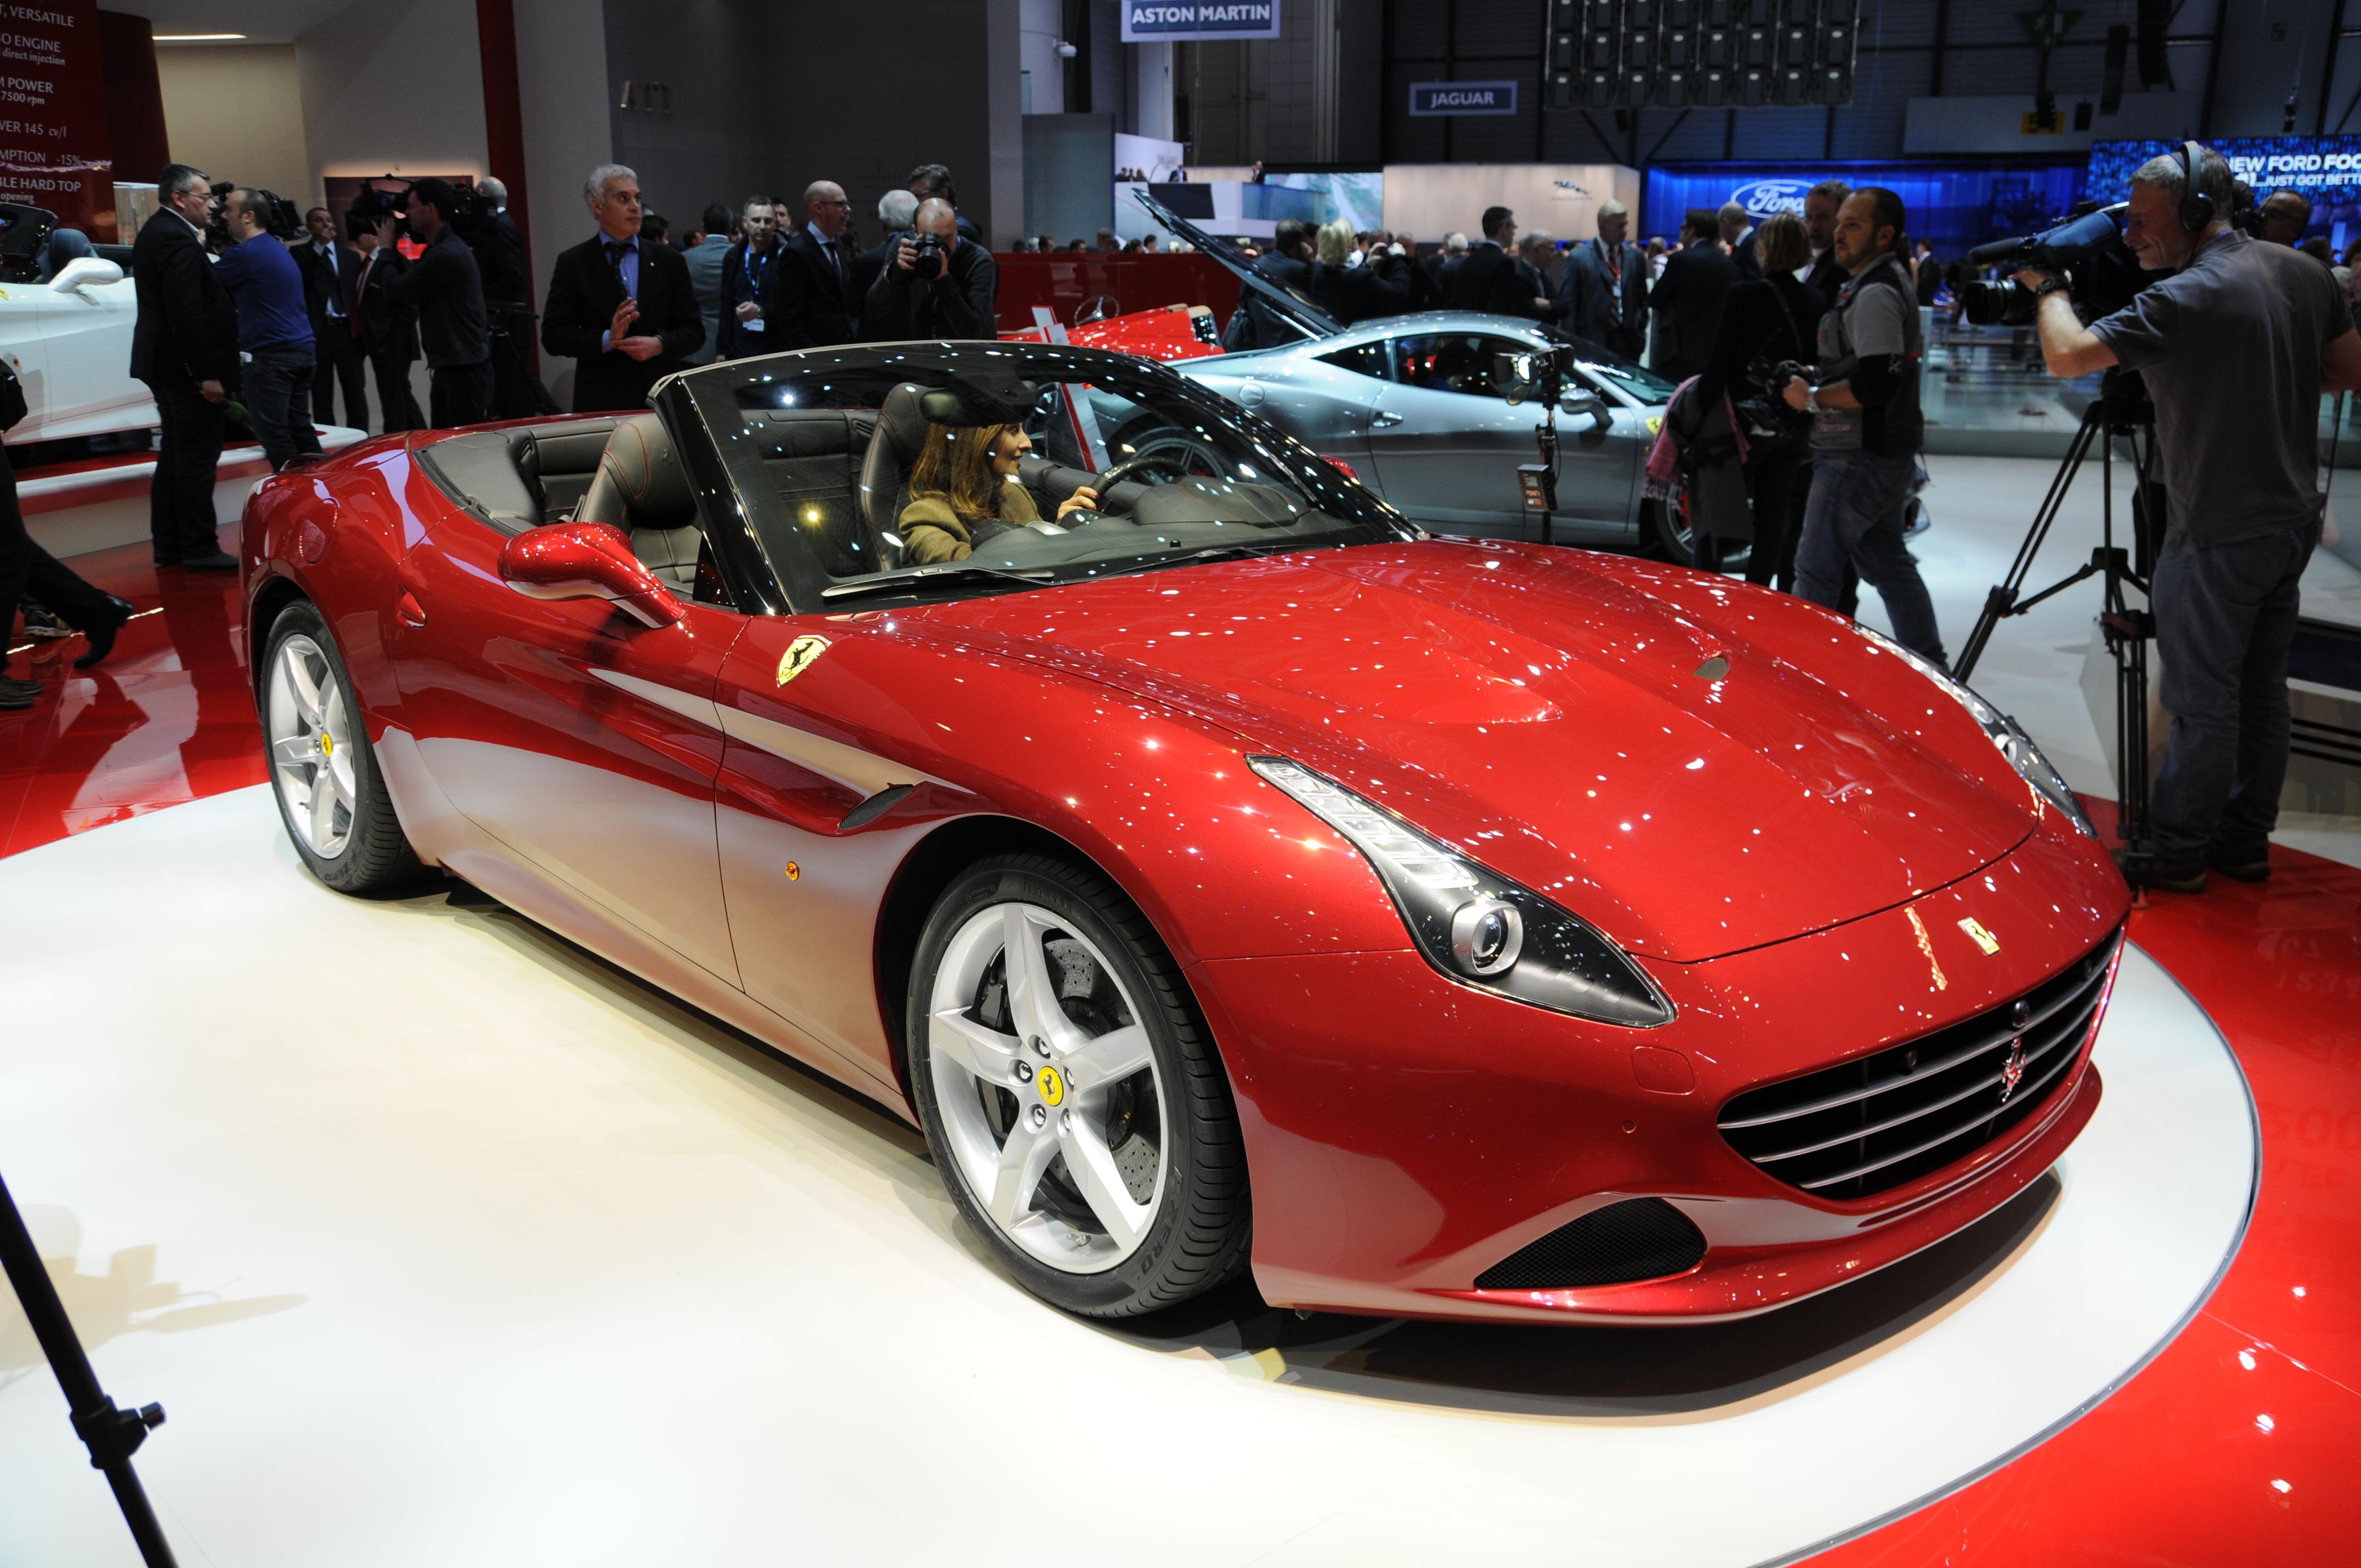 2014 03  >> File 2014 03 04 Geneva Motor Show 1454 Jpg Wikimedia Commons